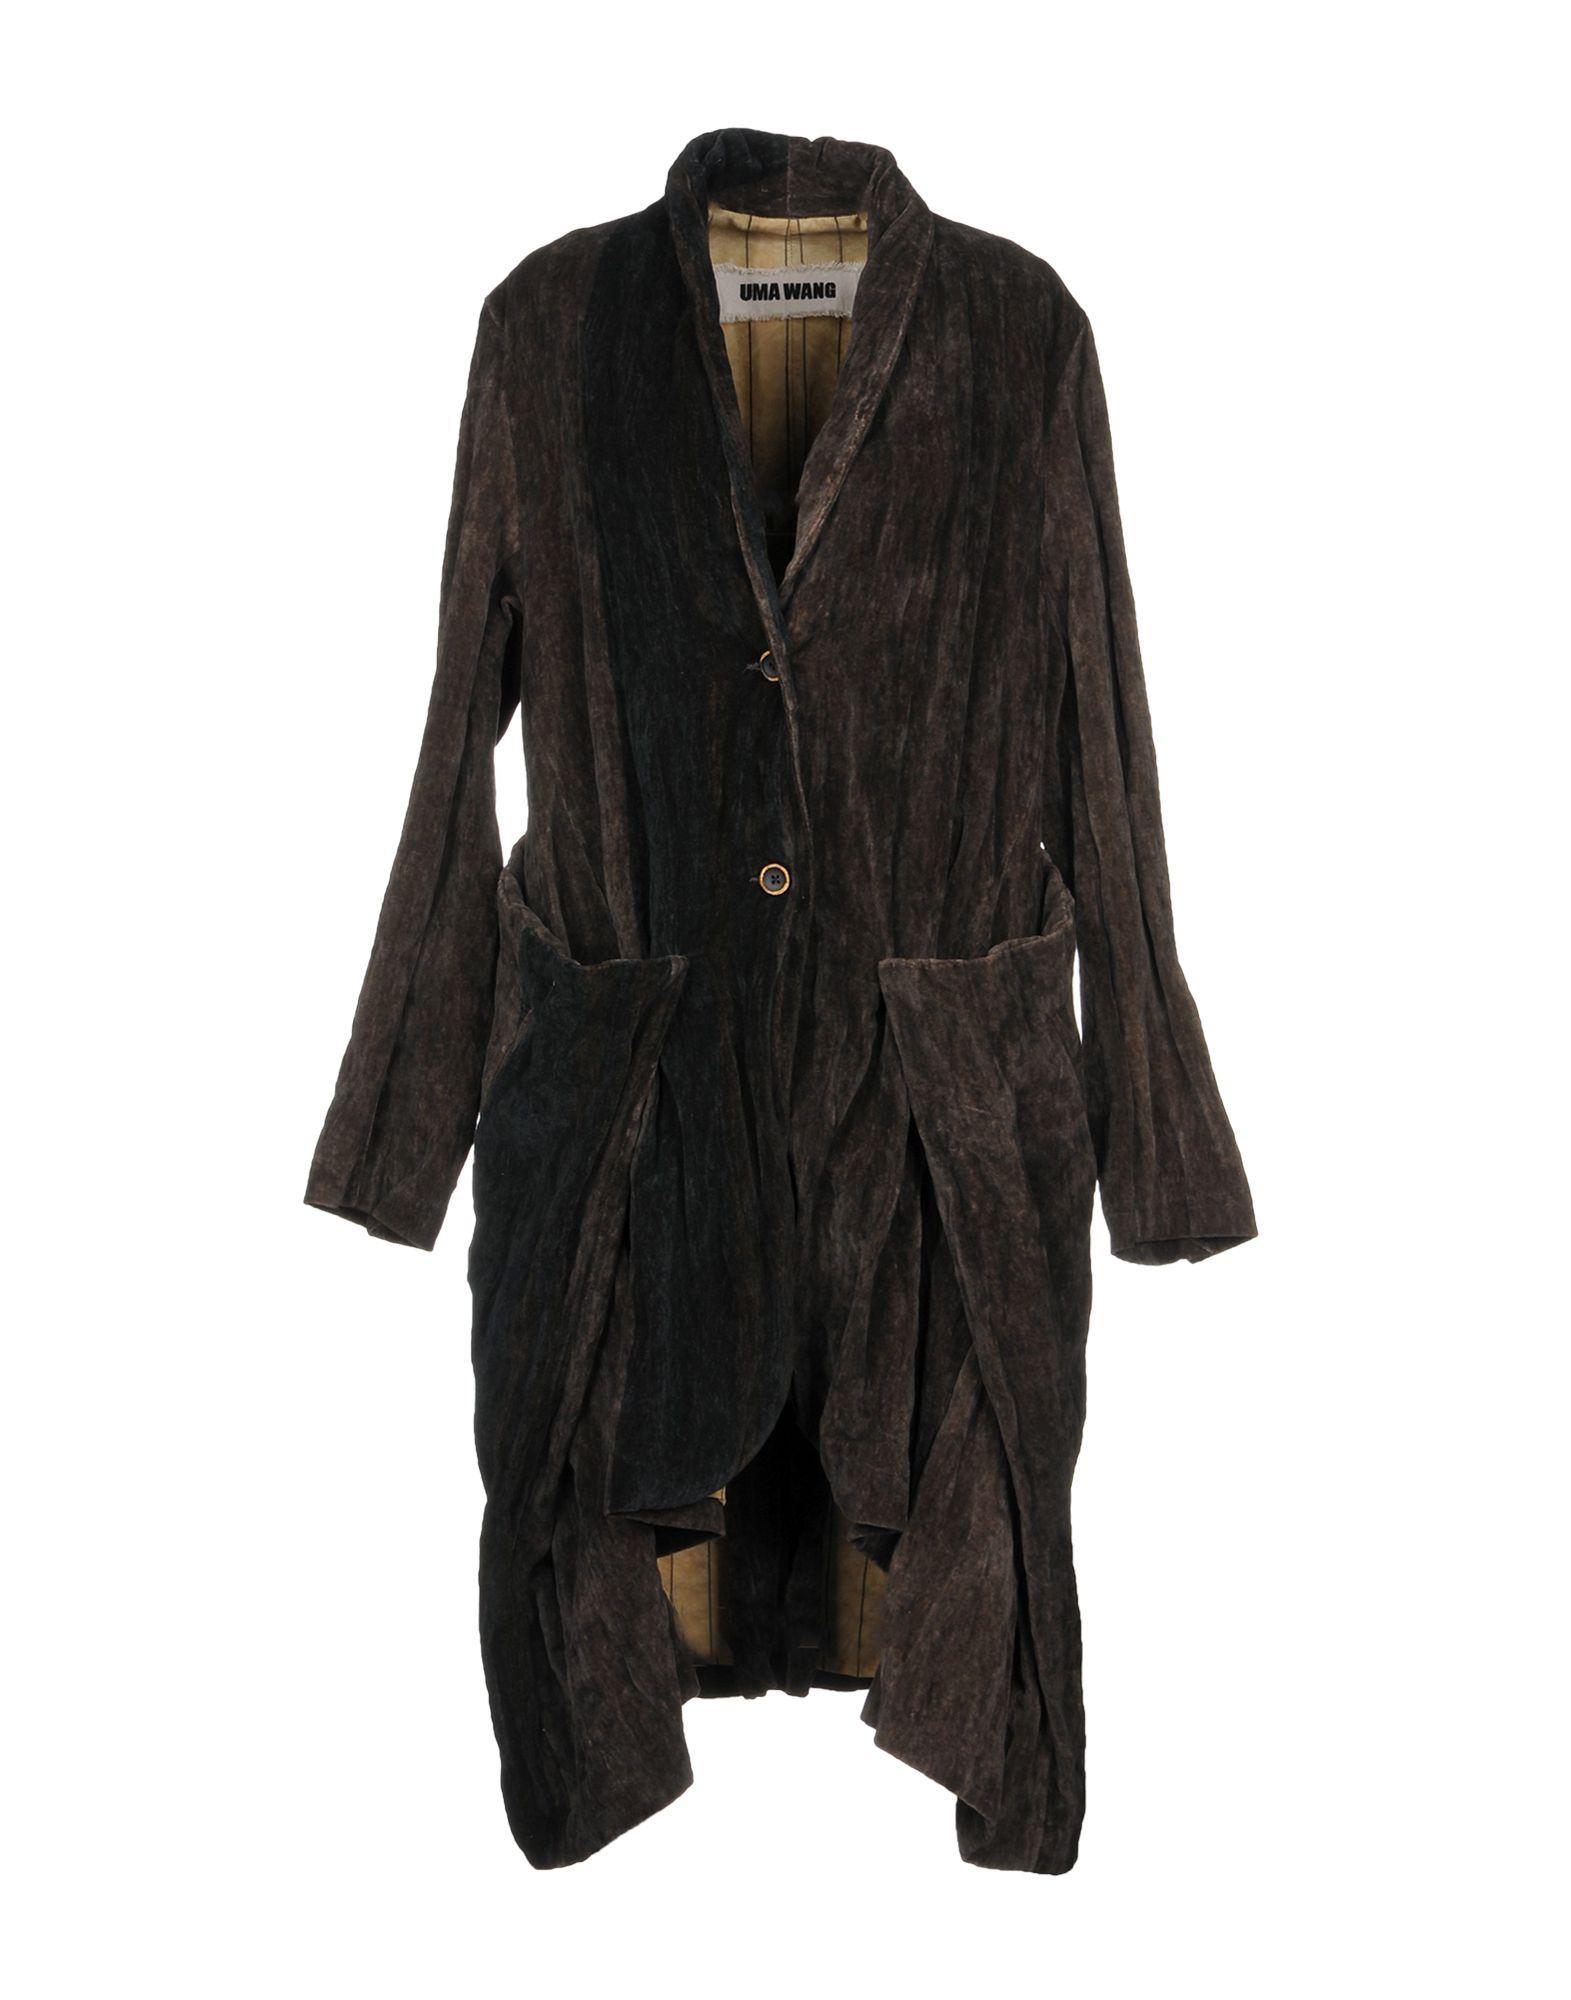 Uma Wang Overcoats In Dark Brown